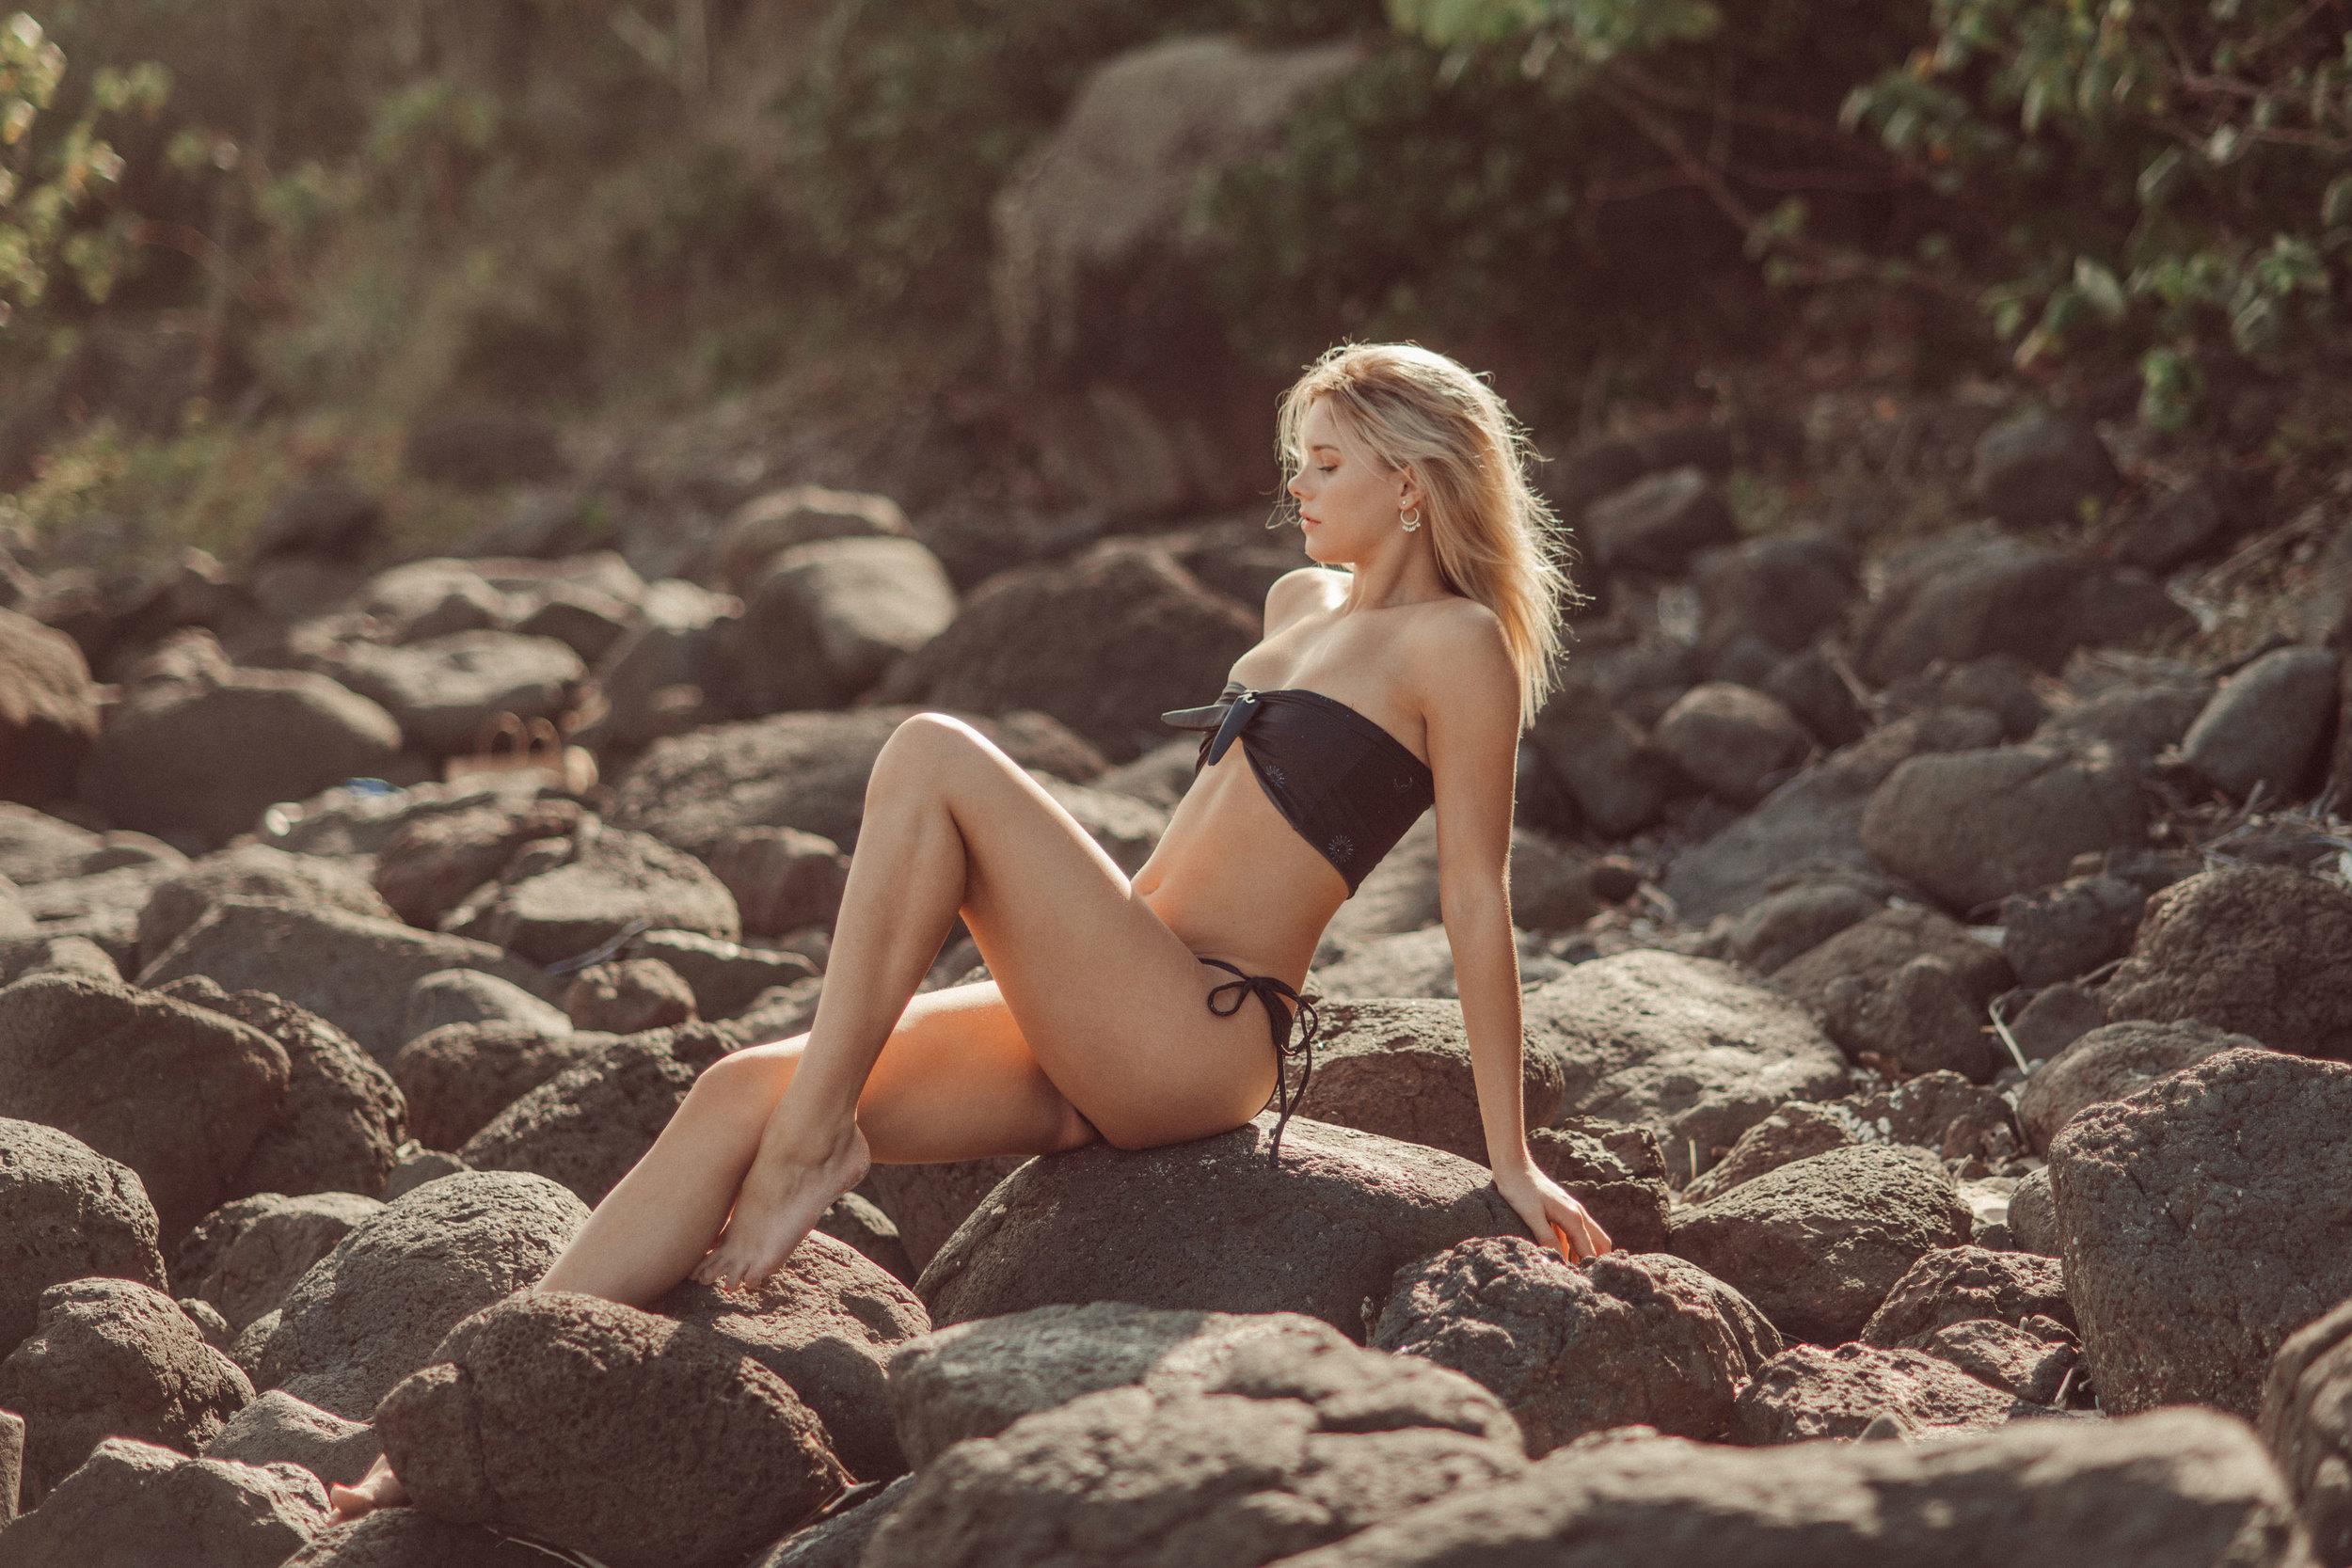 Ethical-Fashion-Bandeau-Tie-Side-Pant-Bikini-Swimwear-Lily-Goodare-Gold-Coast-Model-by-Photographer-Kim-Akrigg-in-Liar-the-Label.jpg